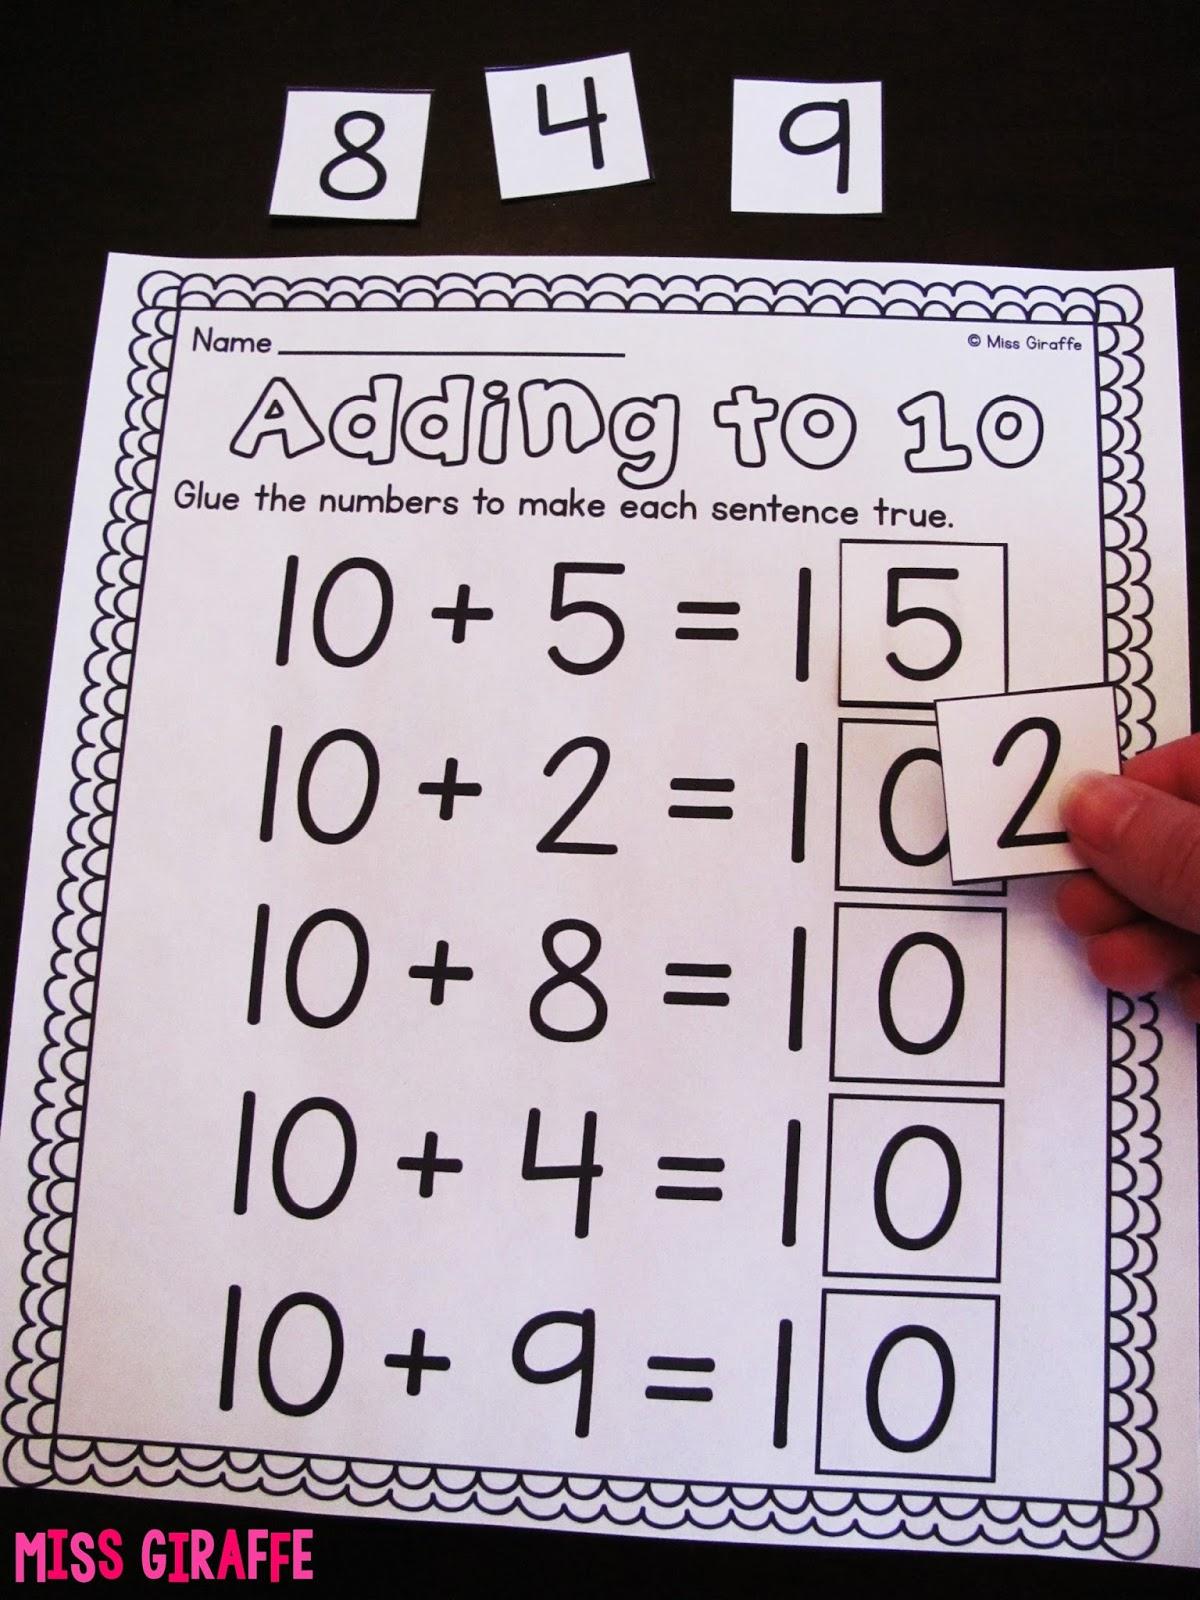 Adding a